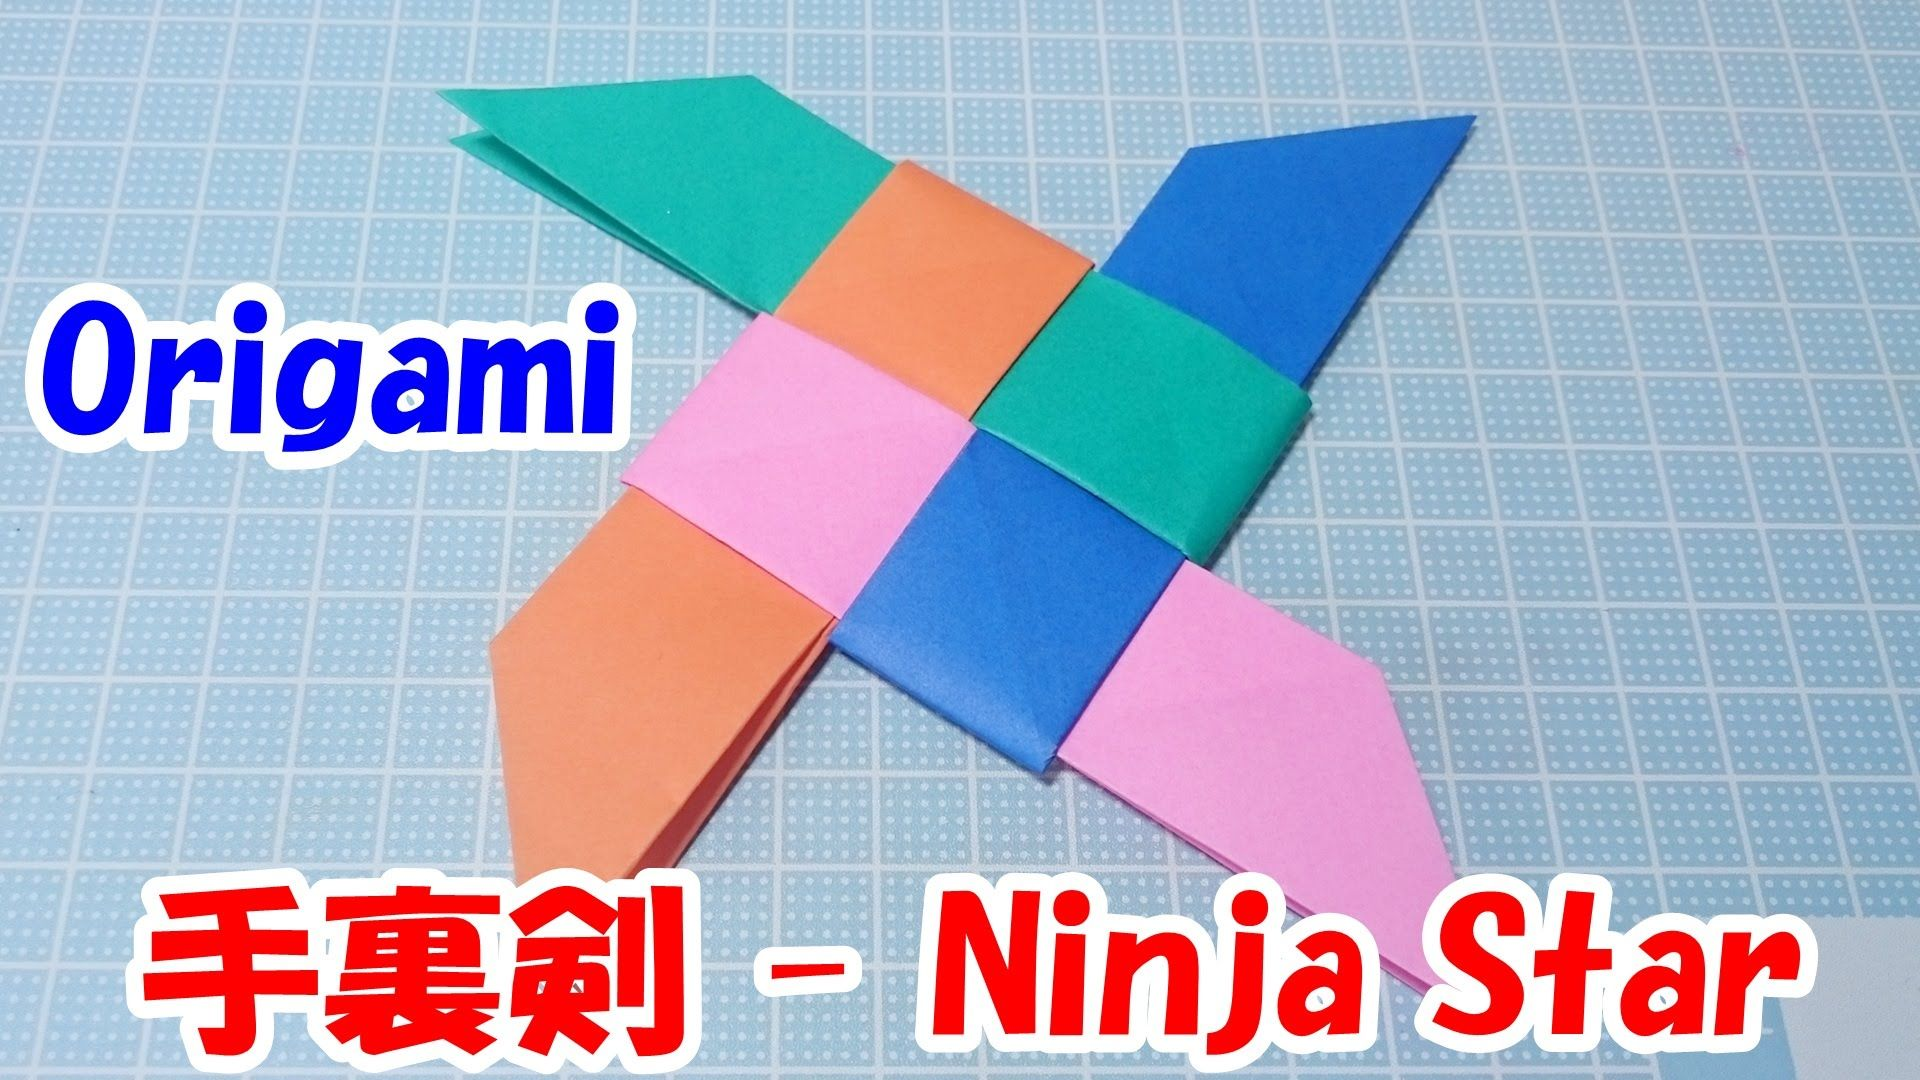 Origami Ninja Star Weapons Easy Tutorial Origami